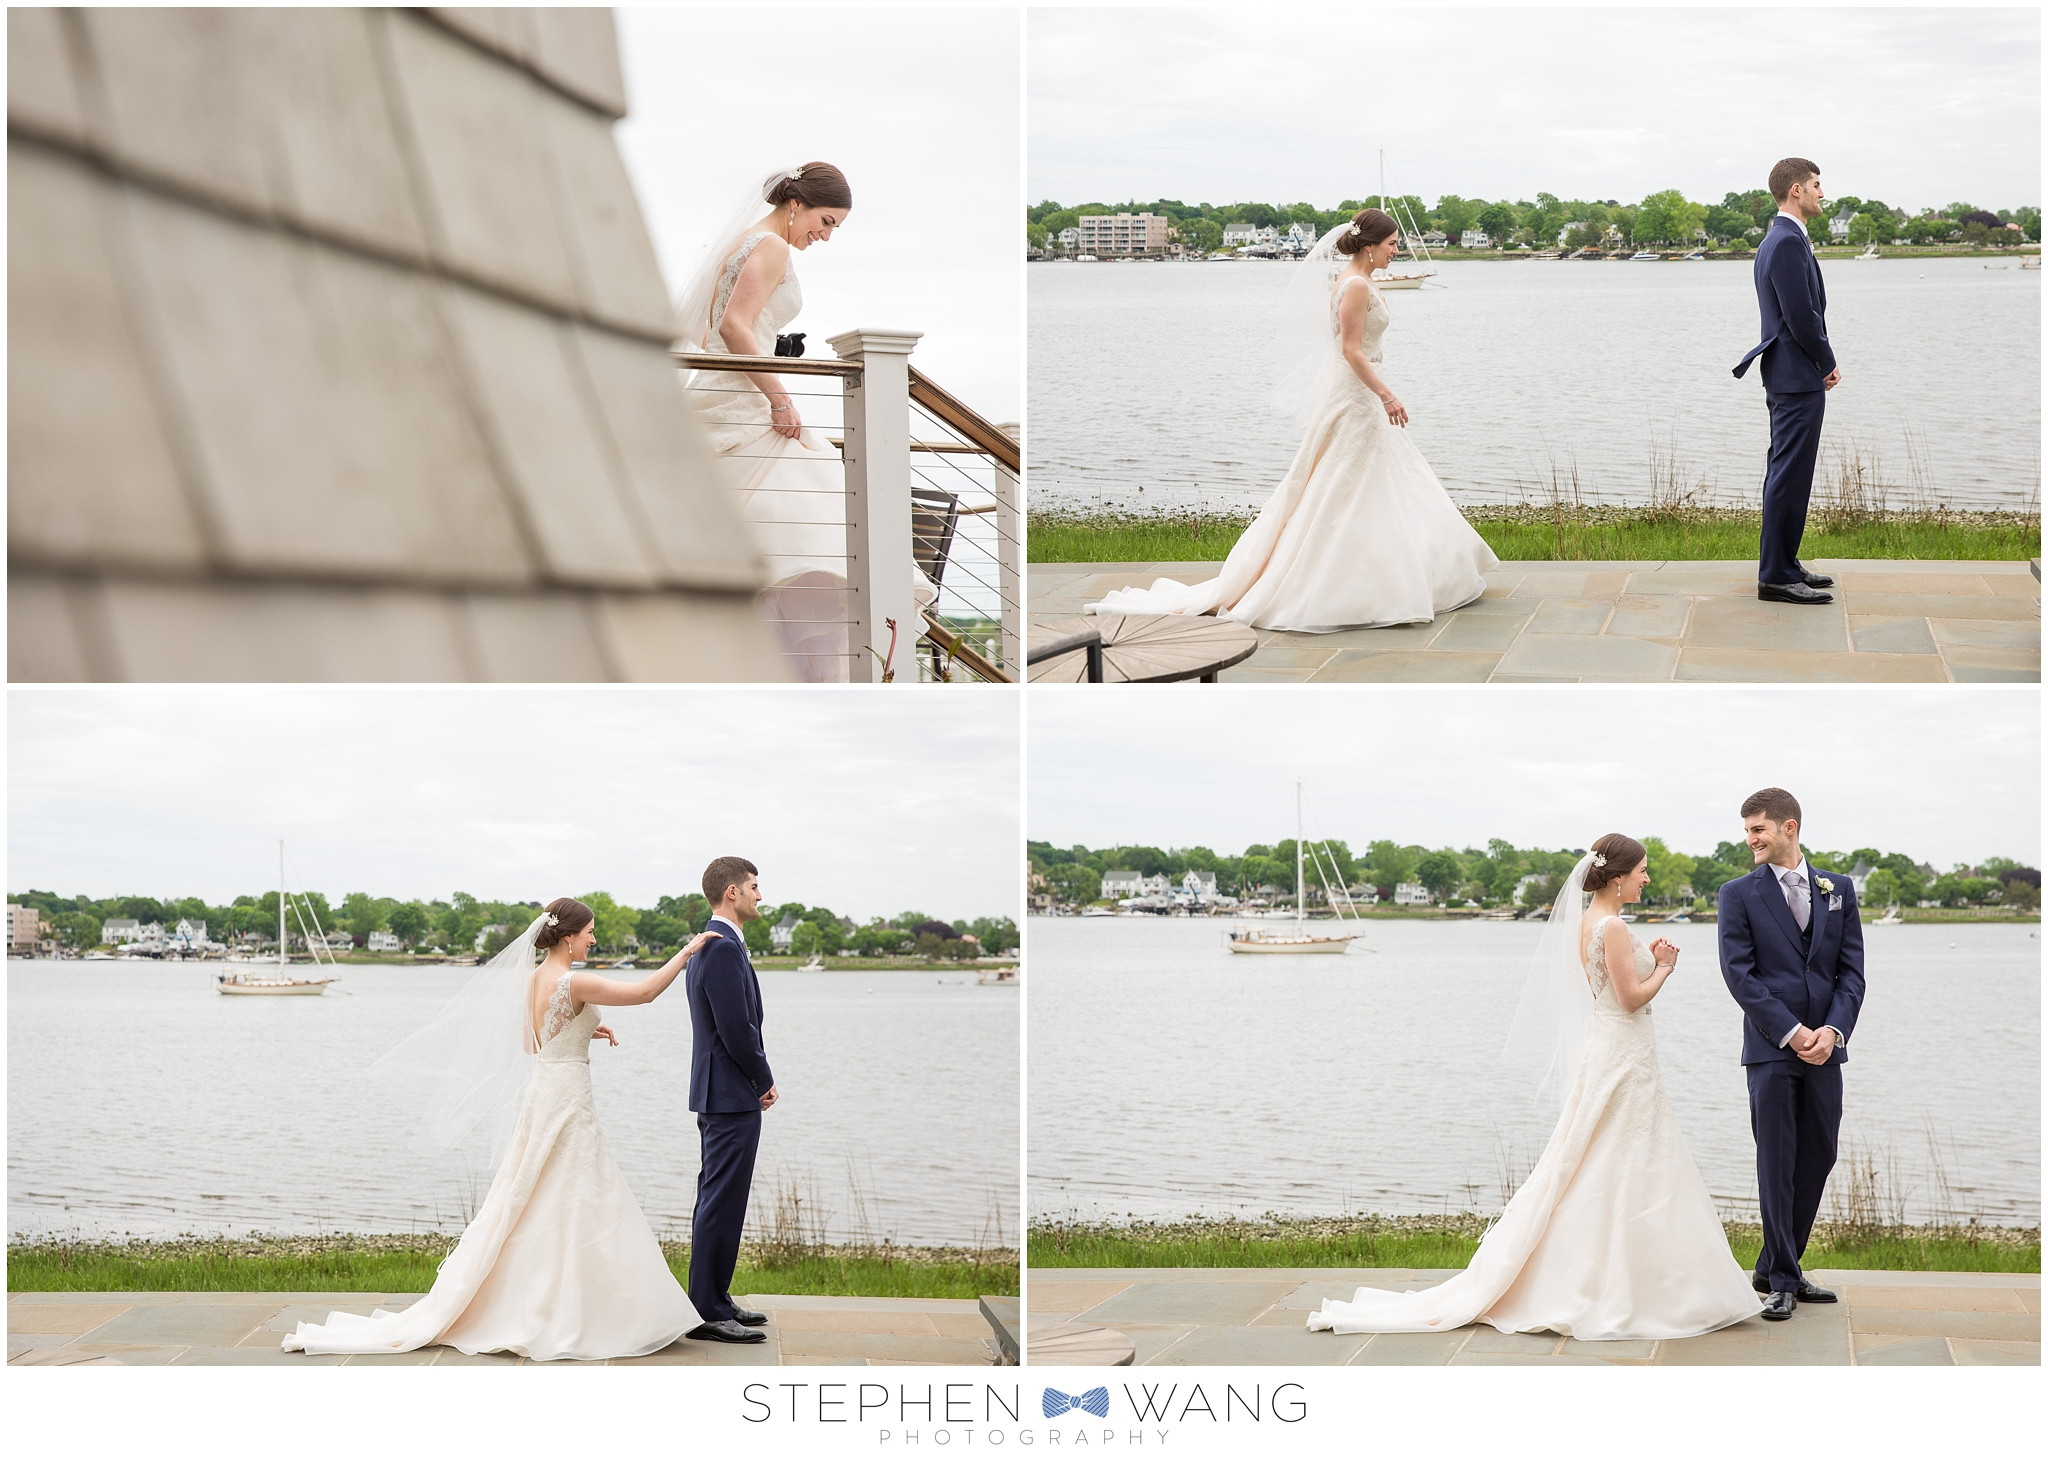 Stephen Wang Photography Shorehaven Norwalk CT Wedding Photographer connecticut shoreline shore haven - 11.jpg